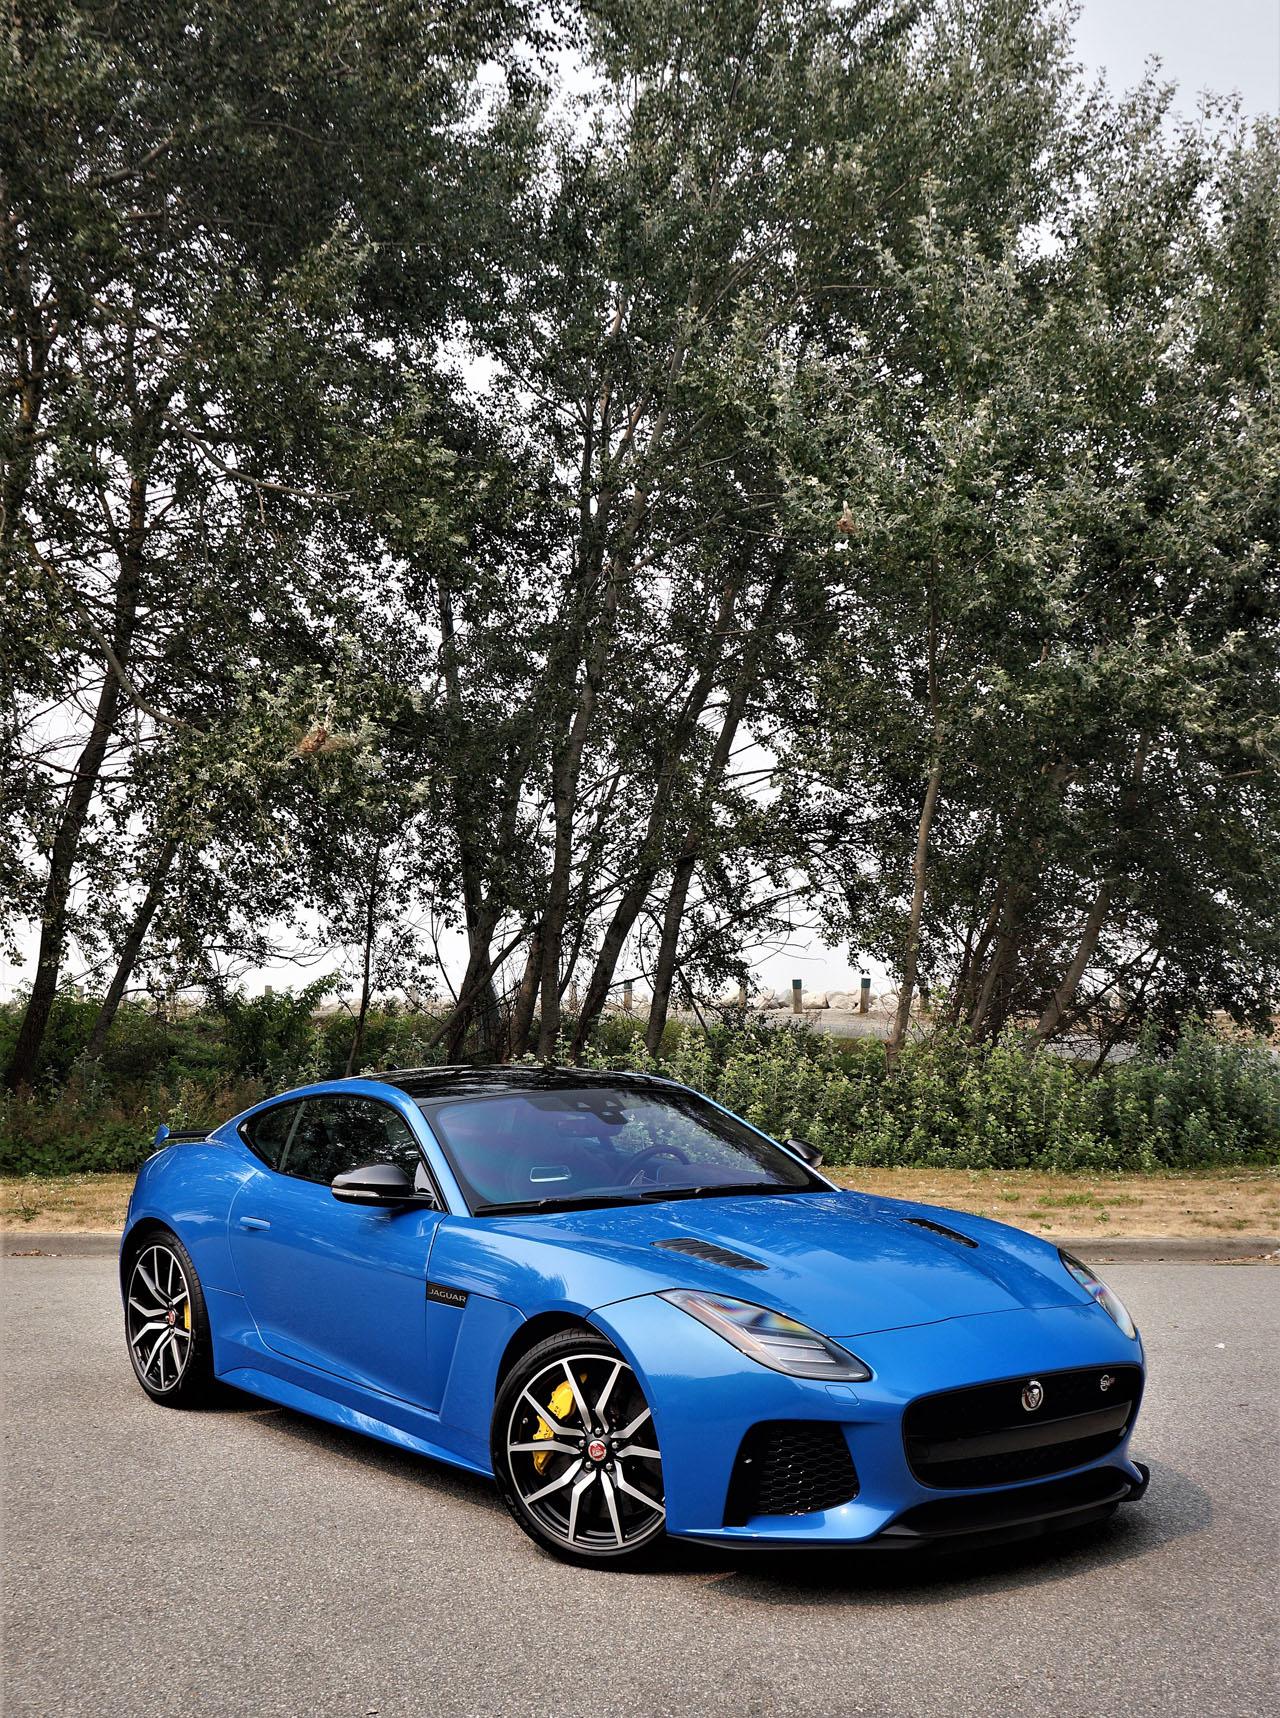 2018 Jaguar F-Type SVR Coupe Road Test | The Car Magazine